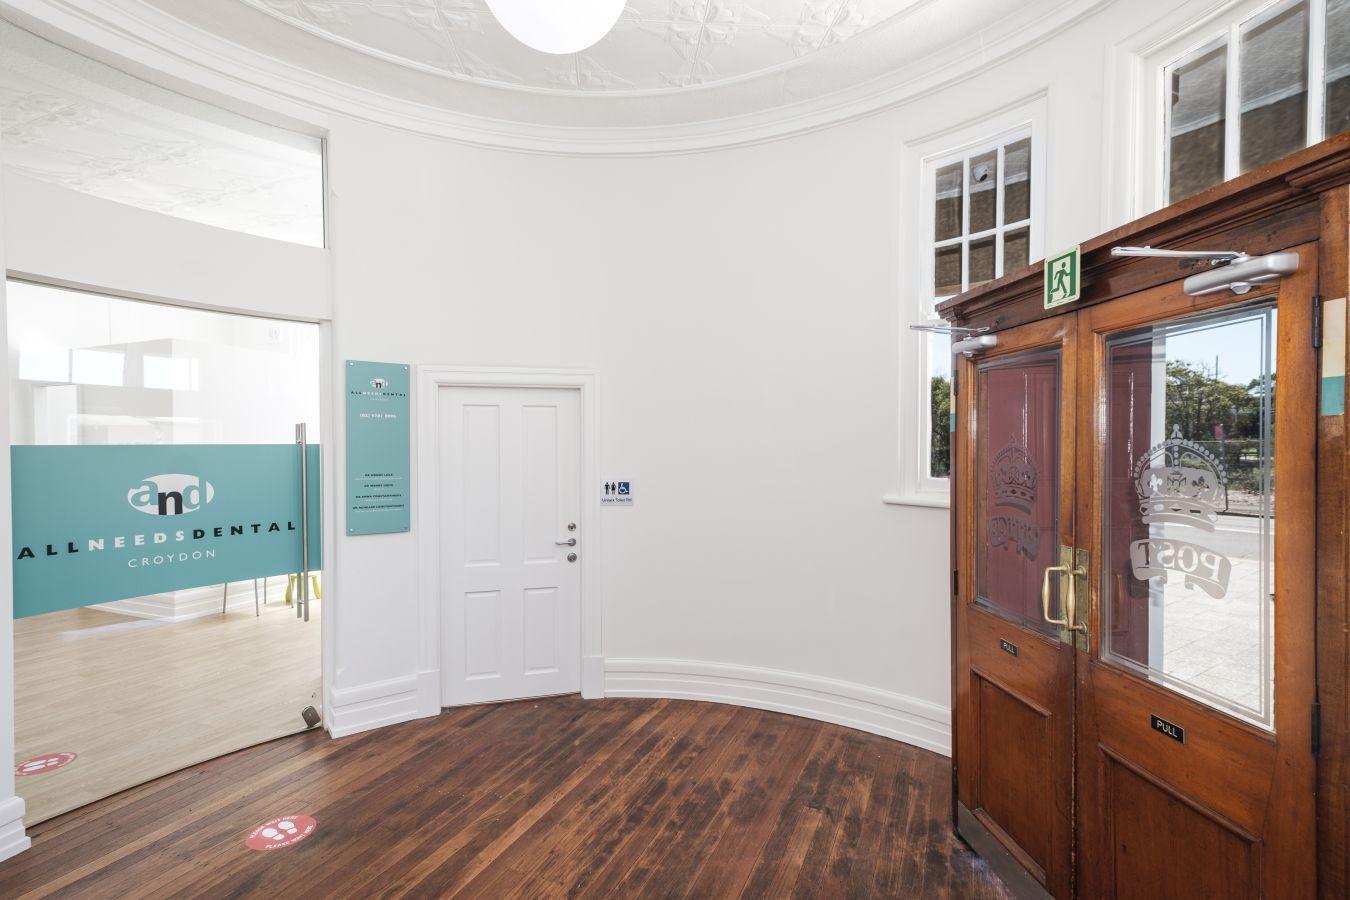 All Needs Dental Croydon foyer